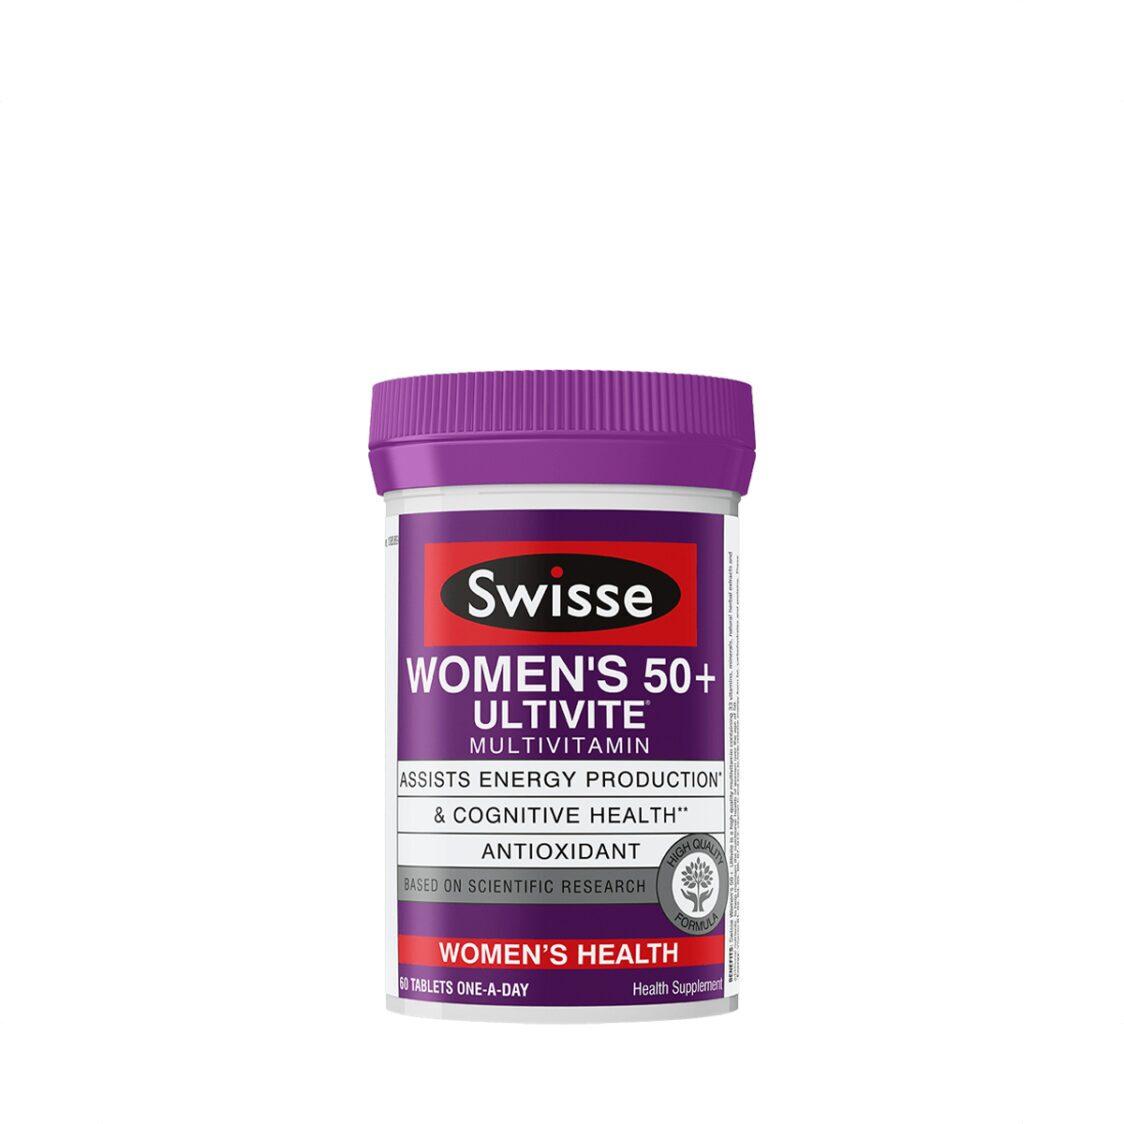 Swisse Womens 50 Ultivite Multivitamin 60s